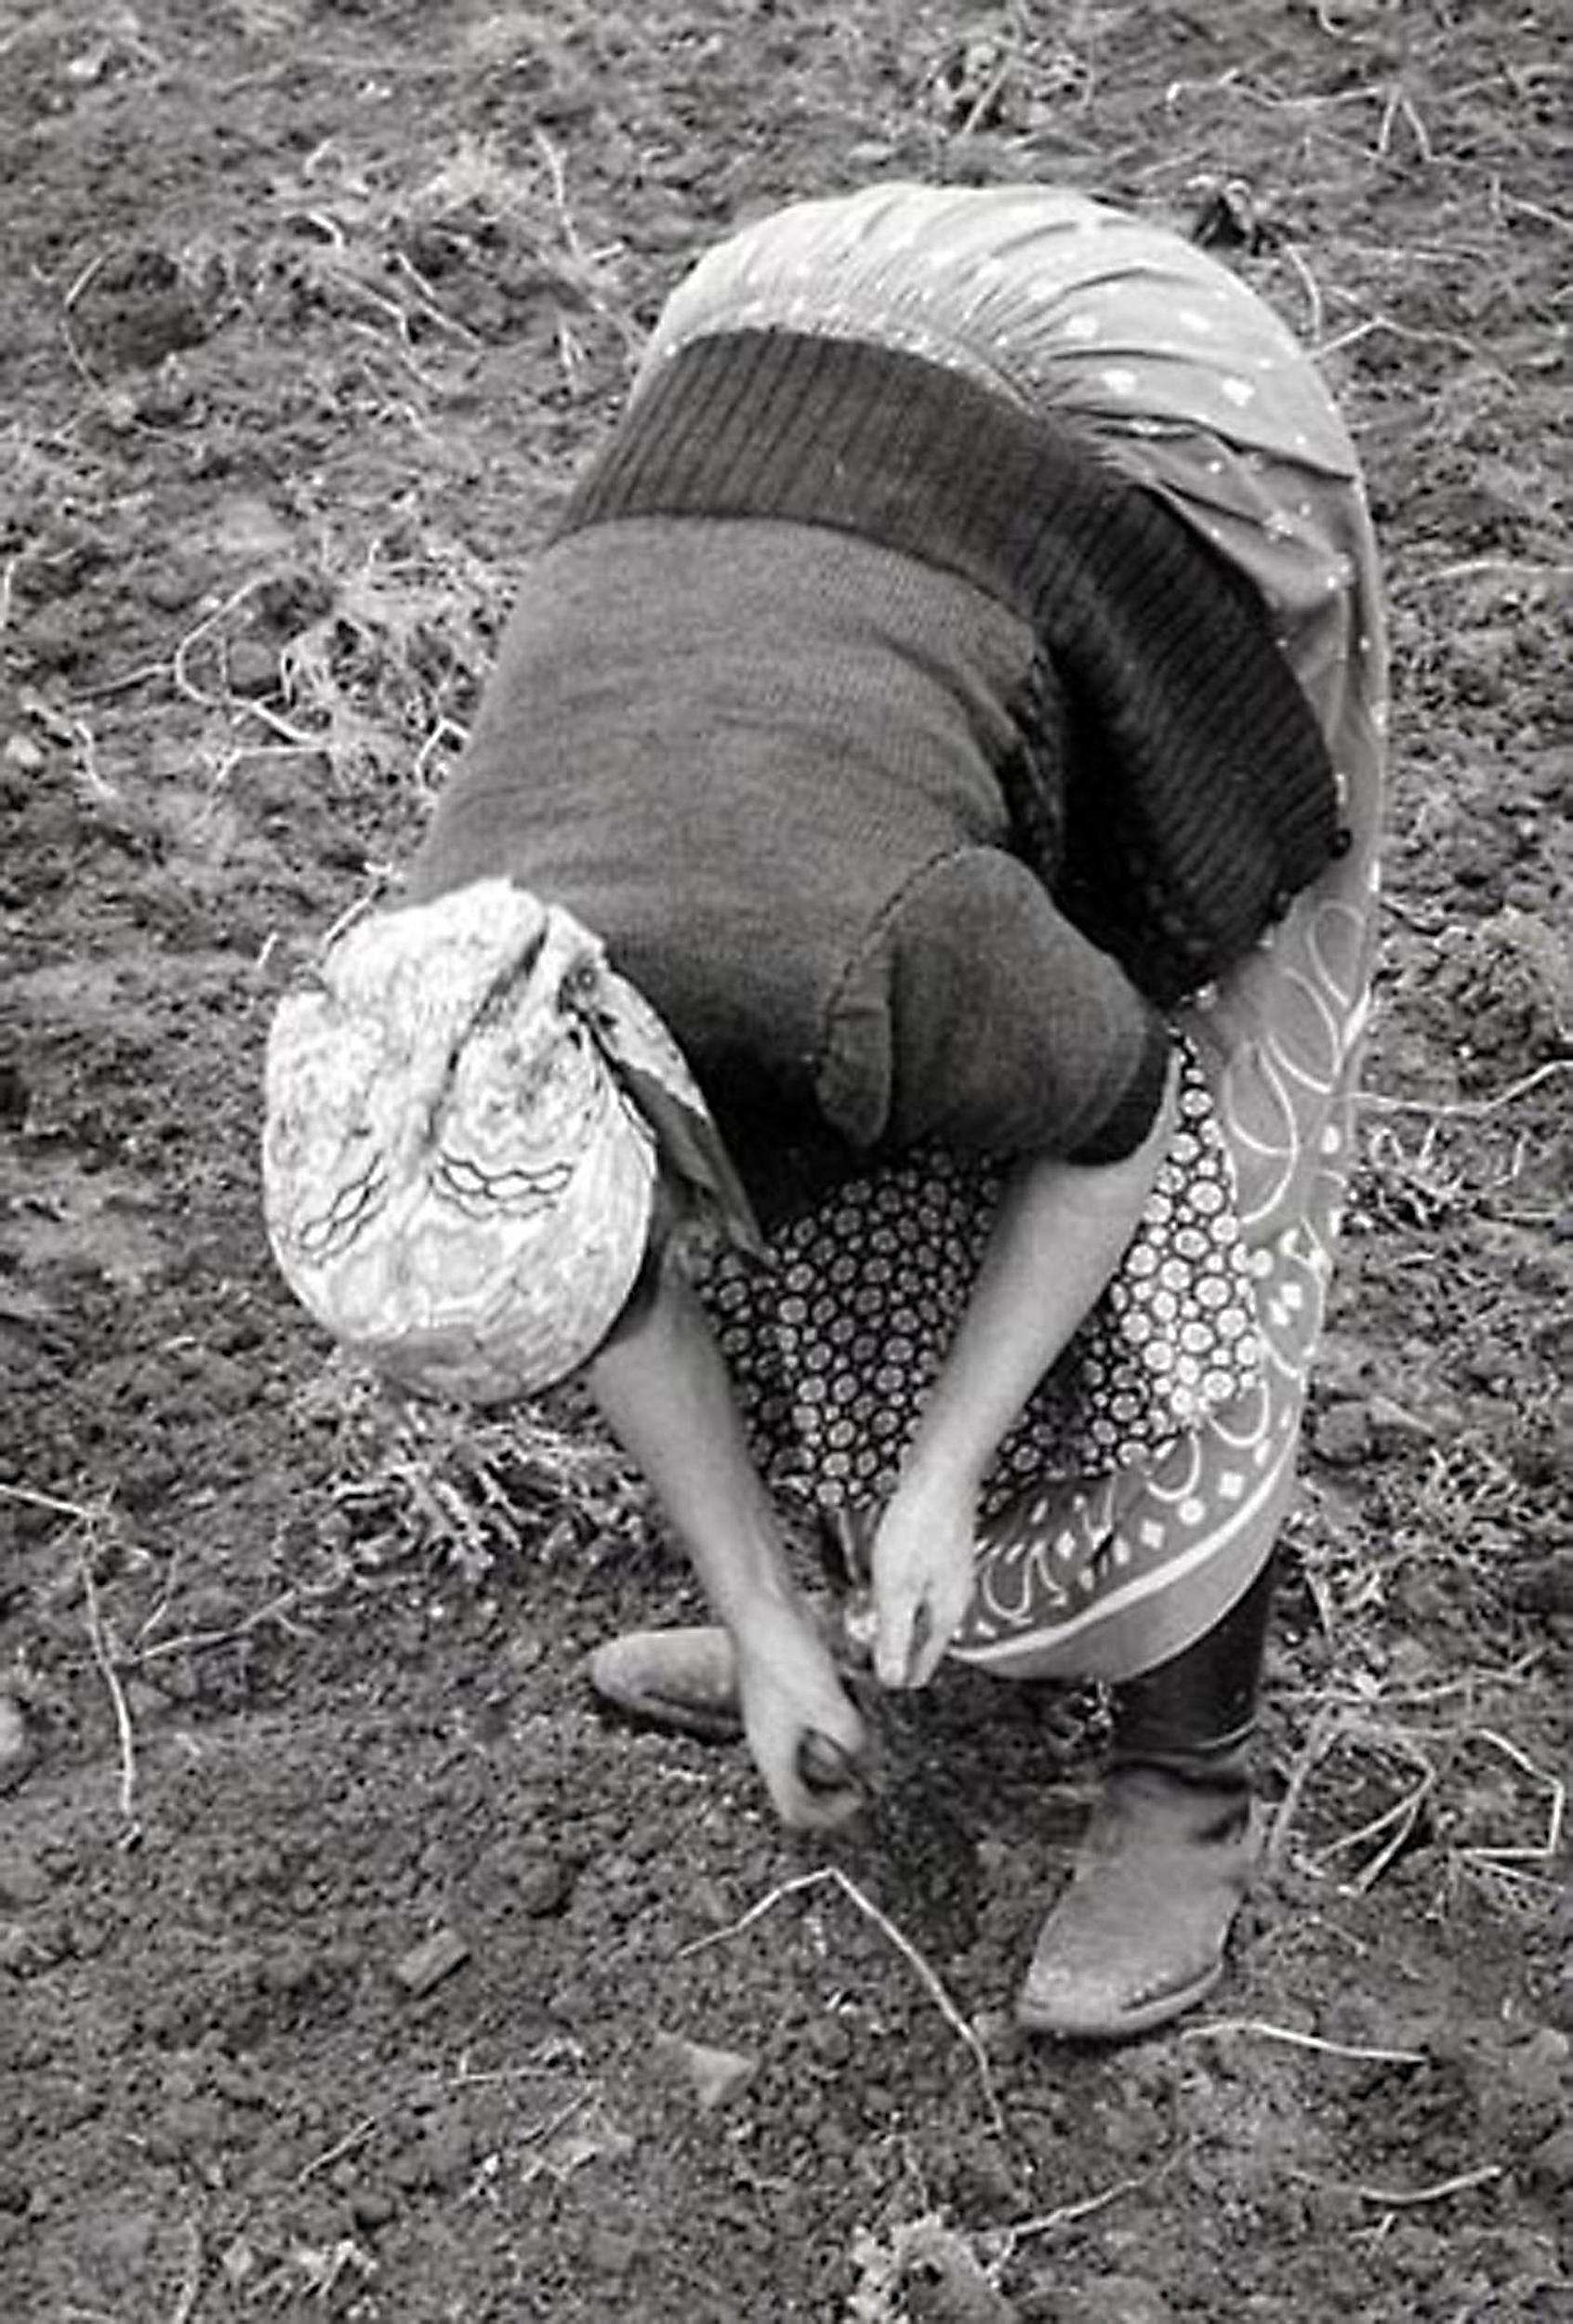 HANNON_potato_picker_(germany)_1957_11x14_high.jpg